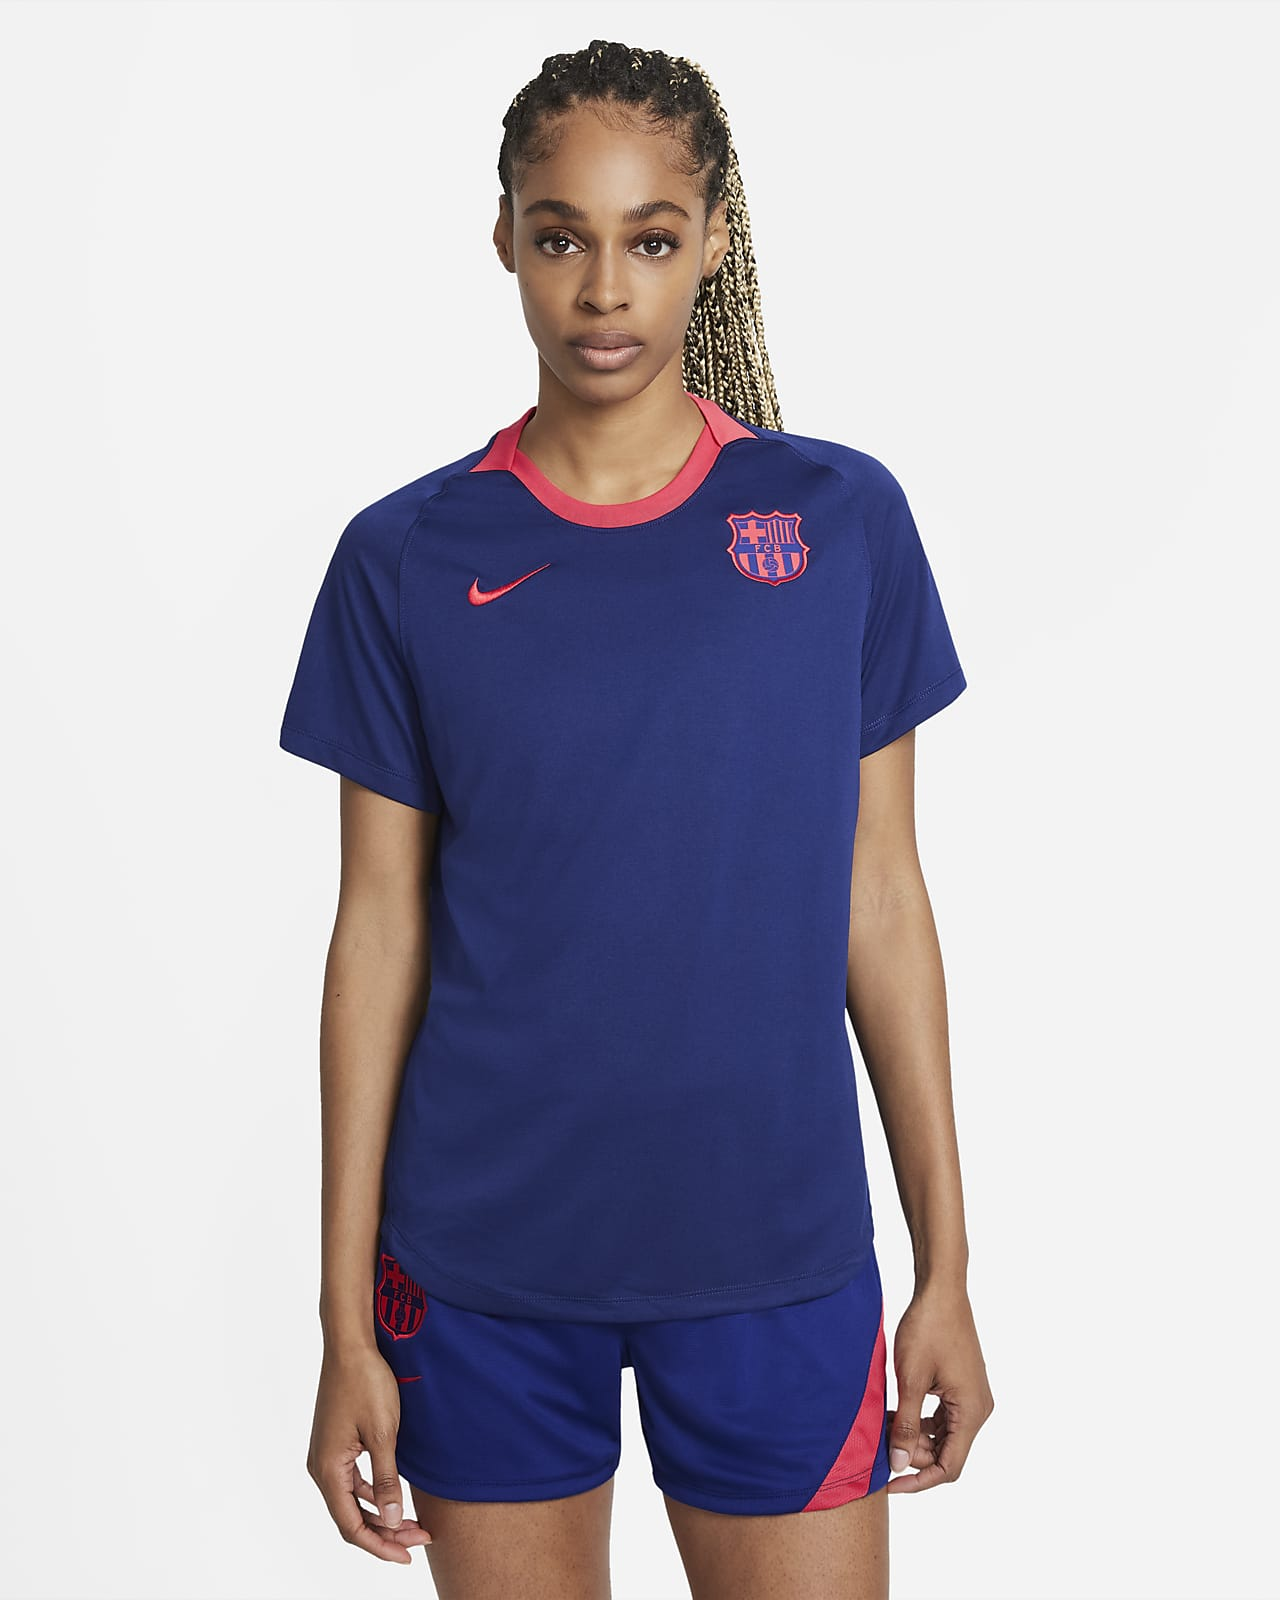 F.C. Barcelona Women's Short-Sleeve Football Top